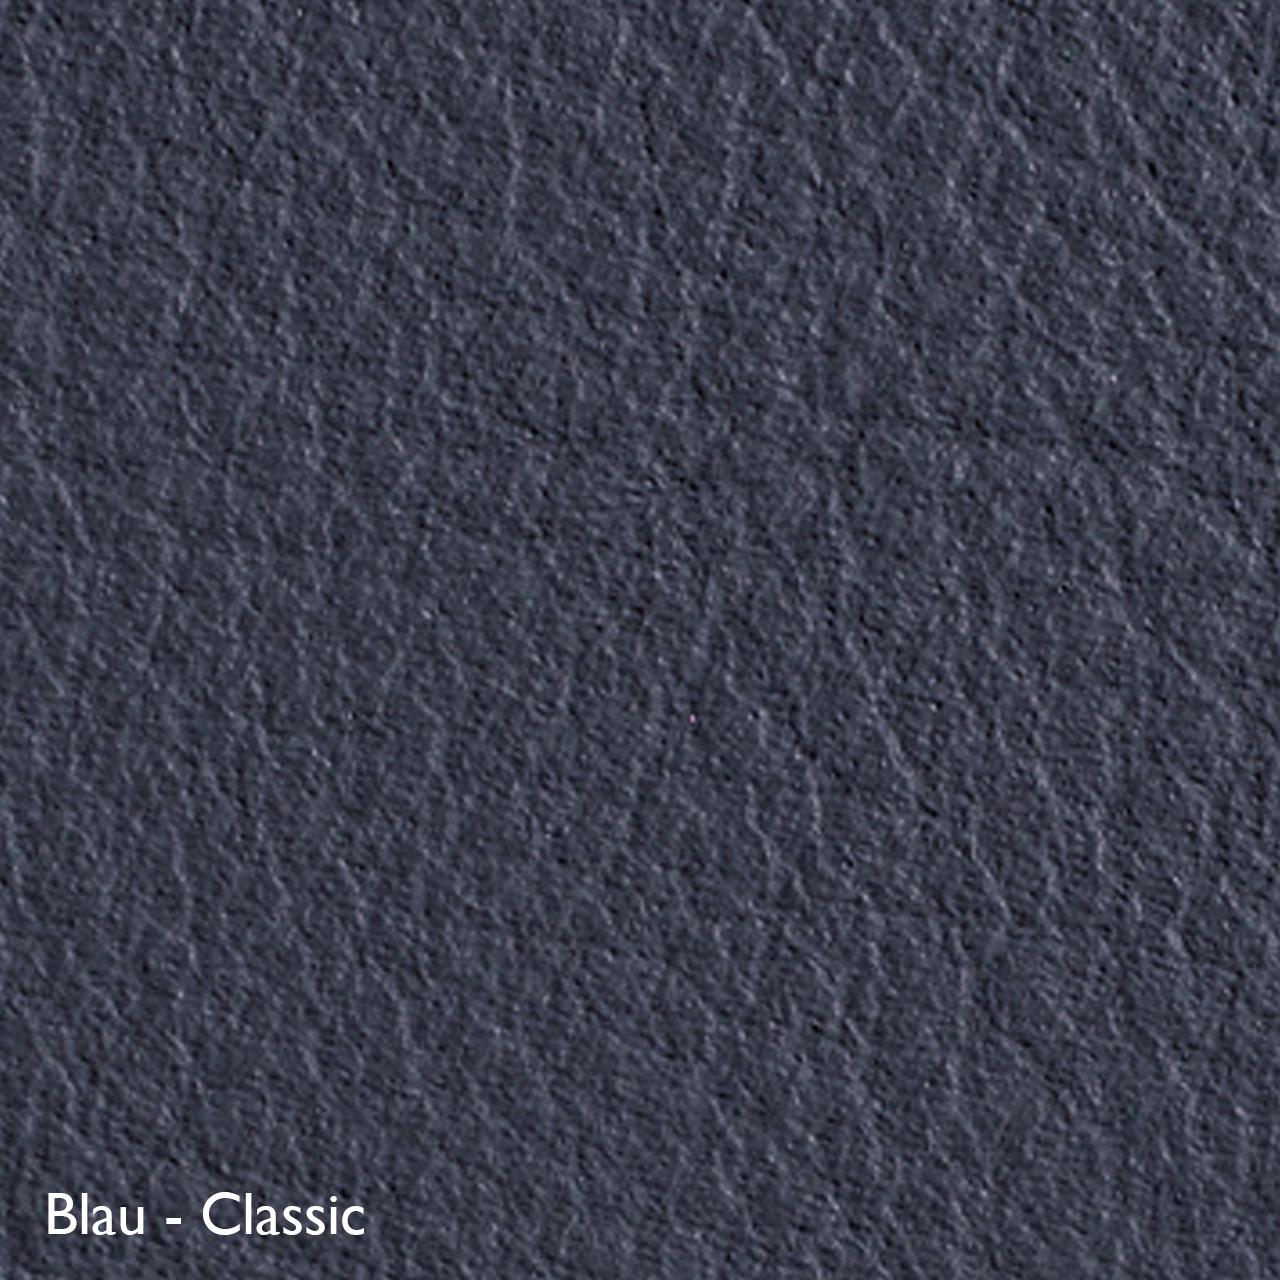 Classicon Sessel 'Euvira' mit Polsterung  Eiche natur,  Filzgleiter,  Blau - Classic